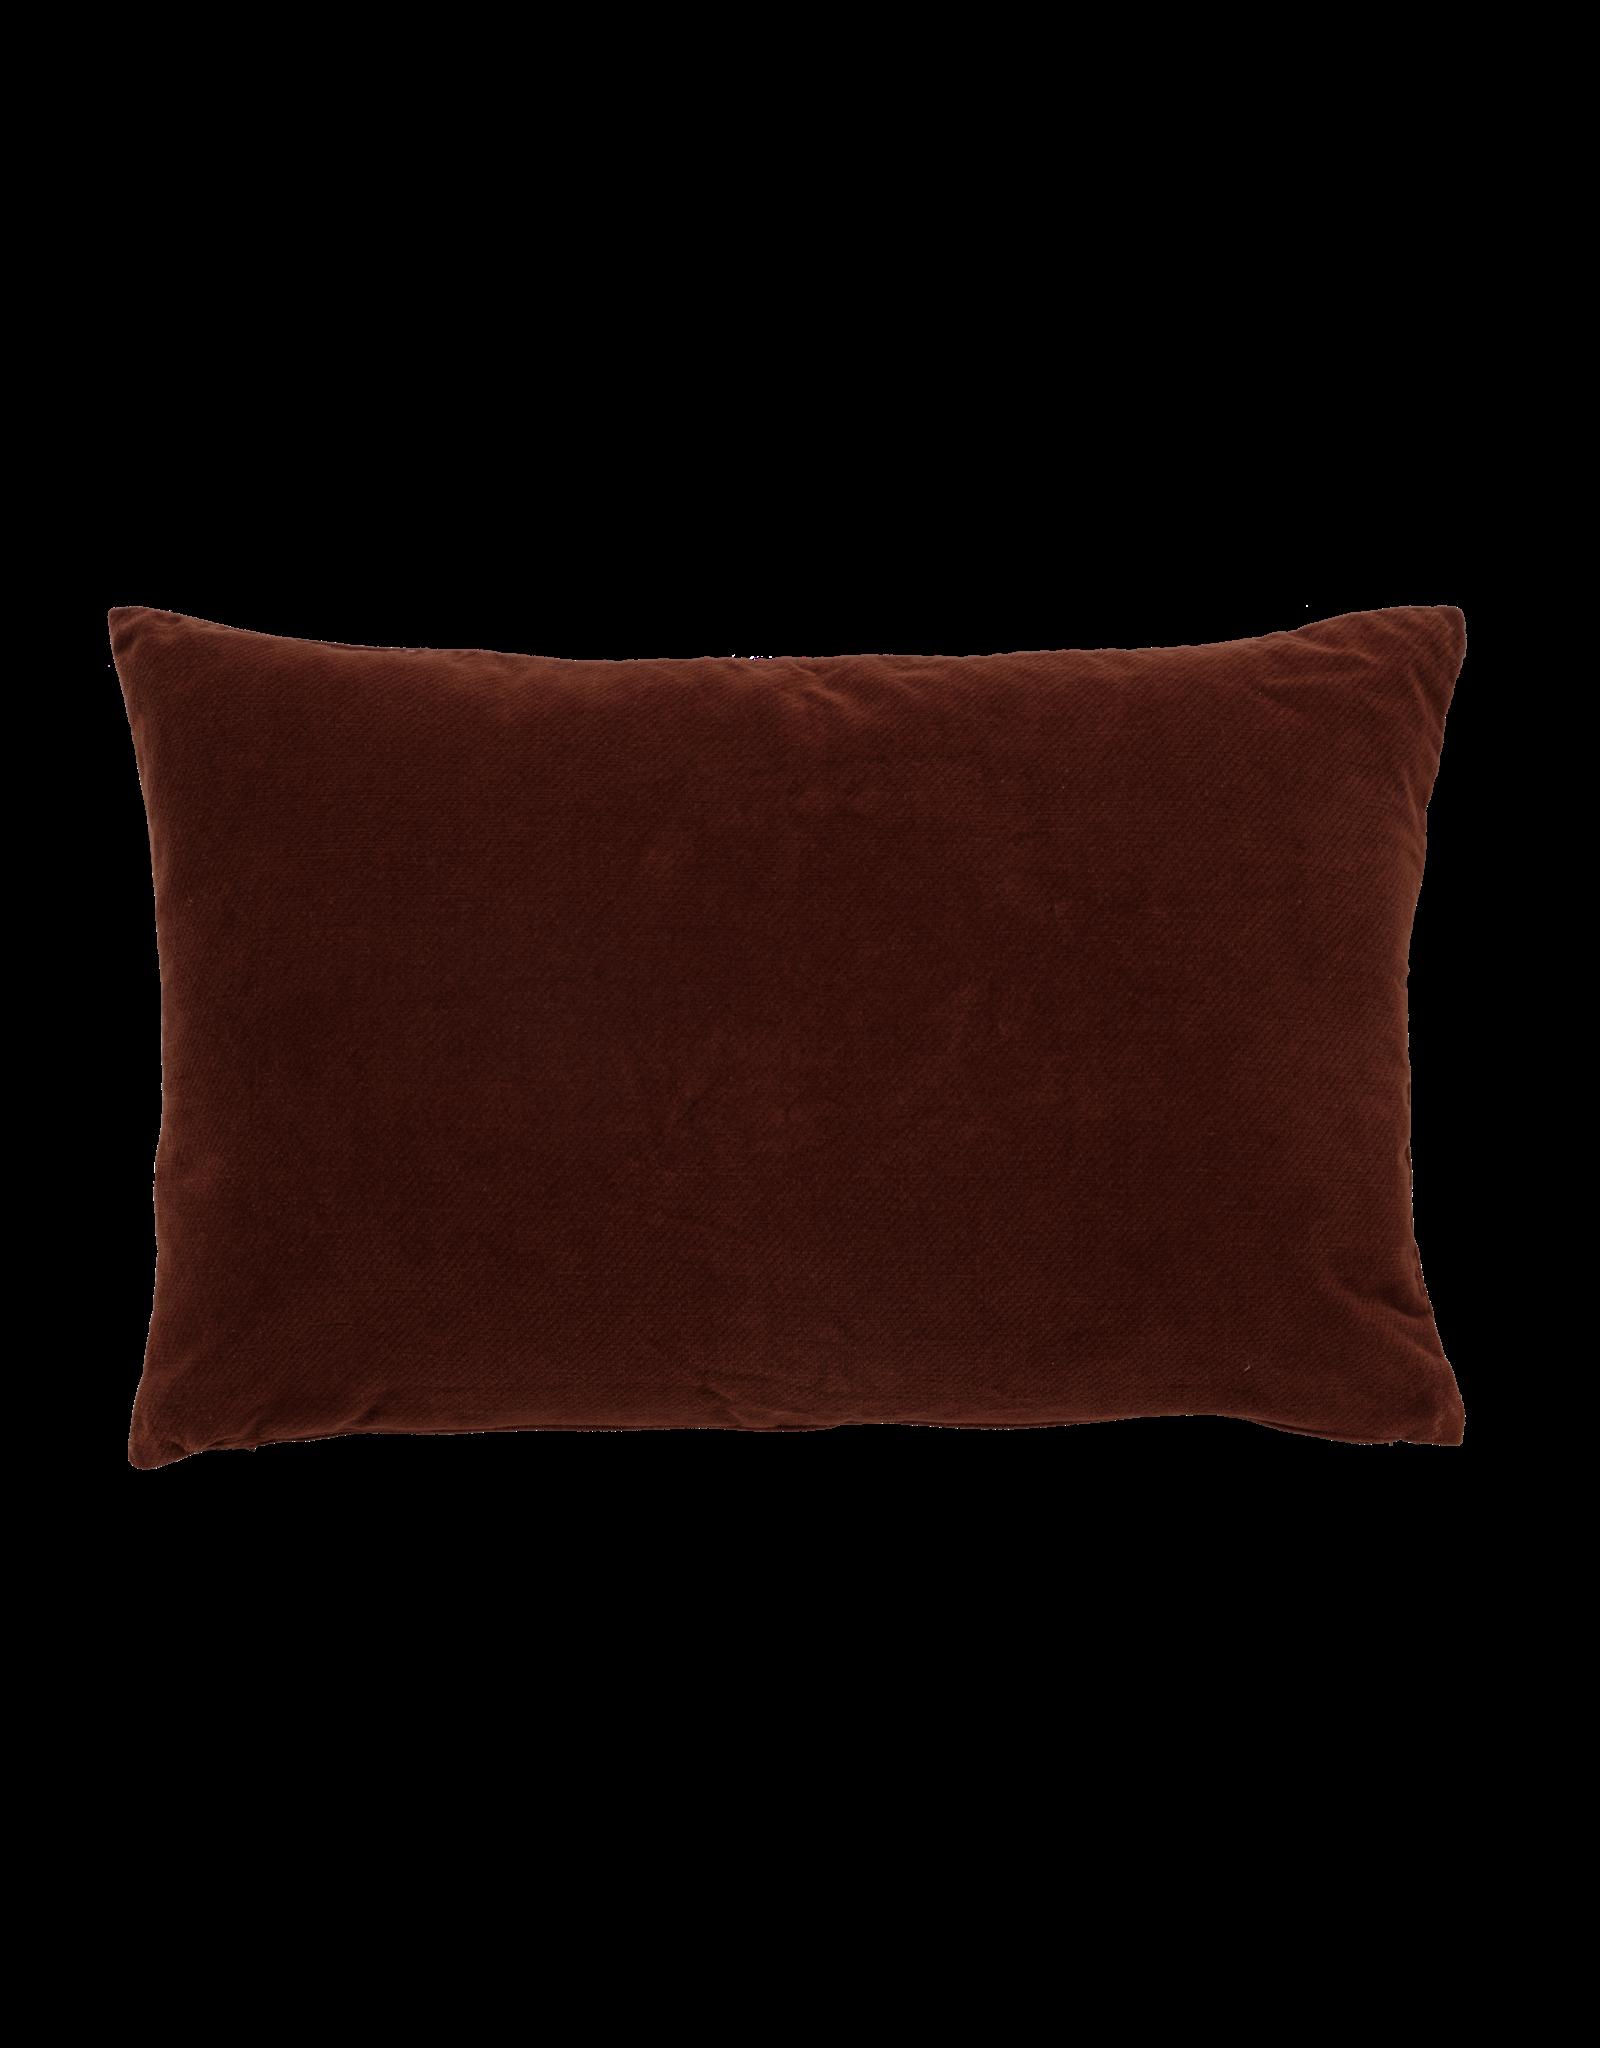 Urban Nature Culture Kussen - Vintage velvet - russet brown